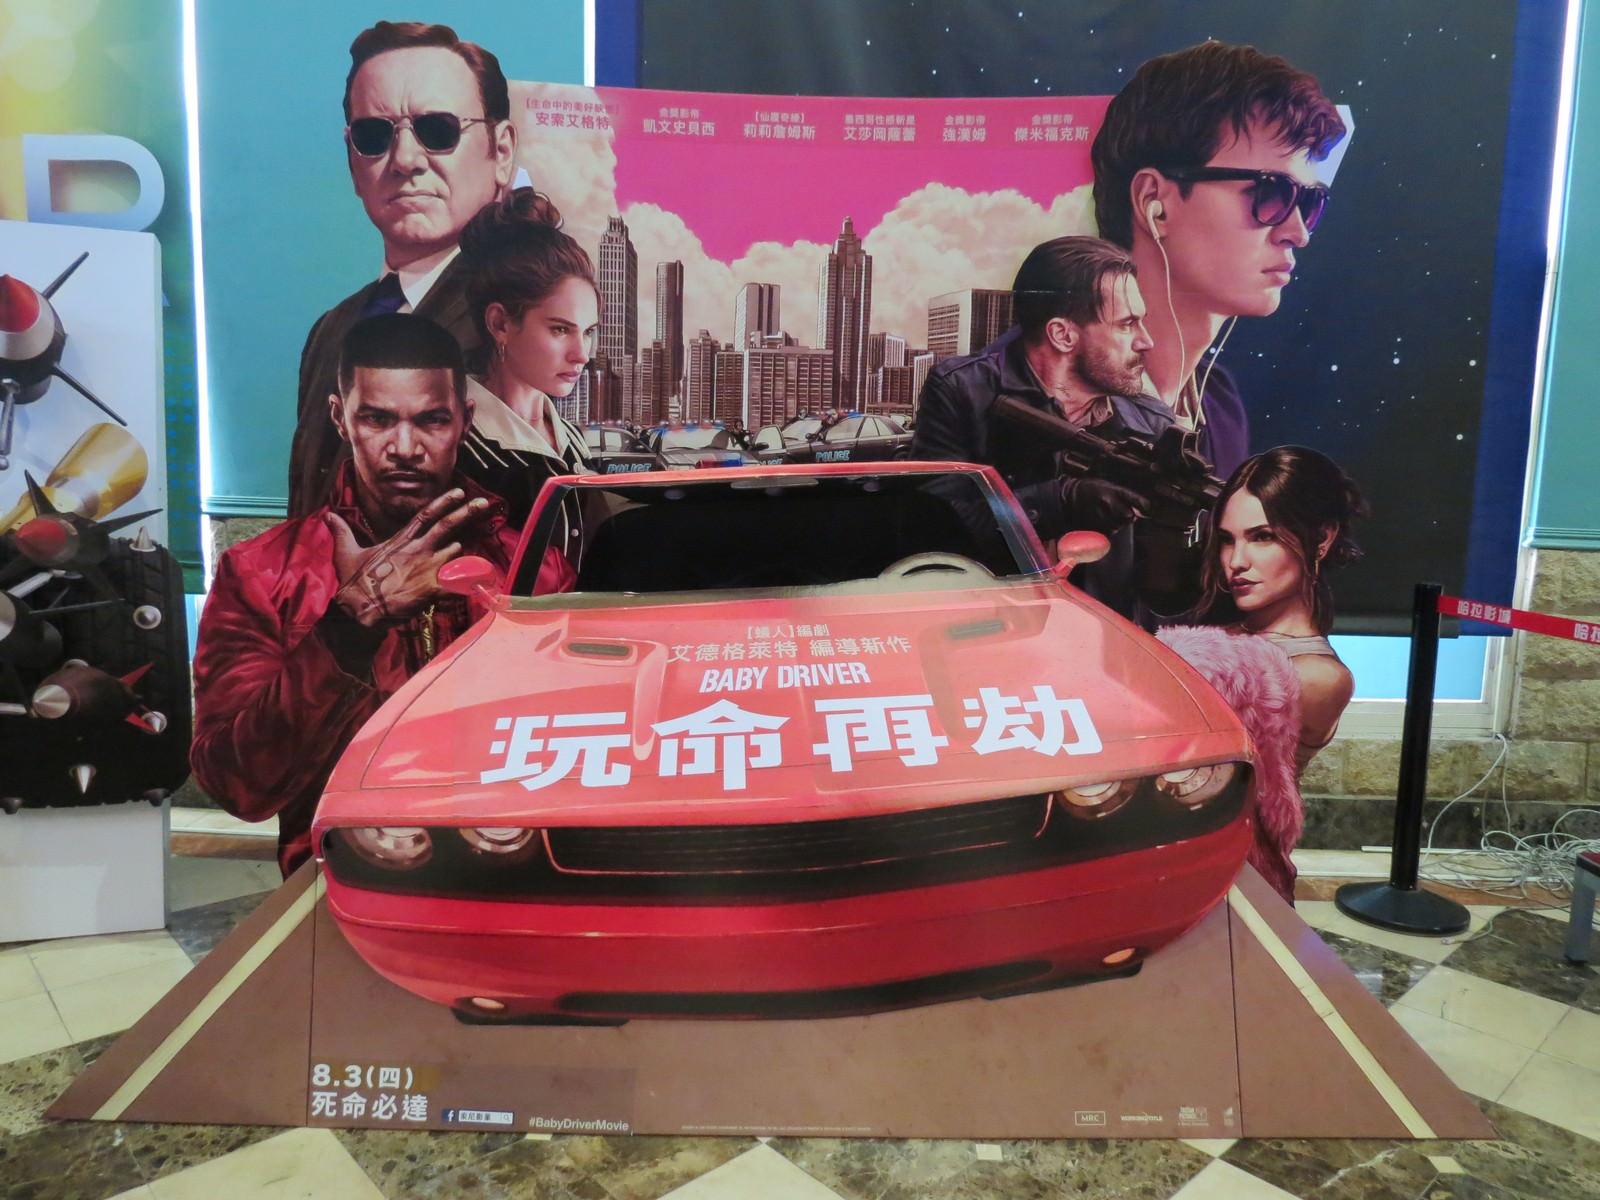 Movie, Baby Driver(美國, 2017年) / 玩命再劫(台灣) / 极盗车神(中國) / 寶貝車神(香港), 廣告看板, 哈拉影城